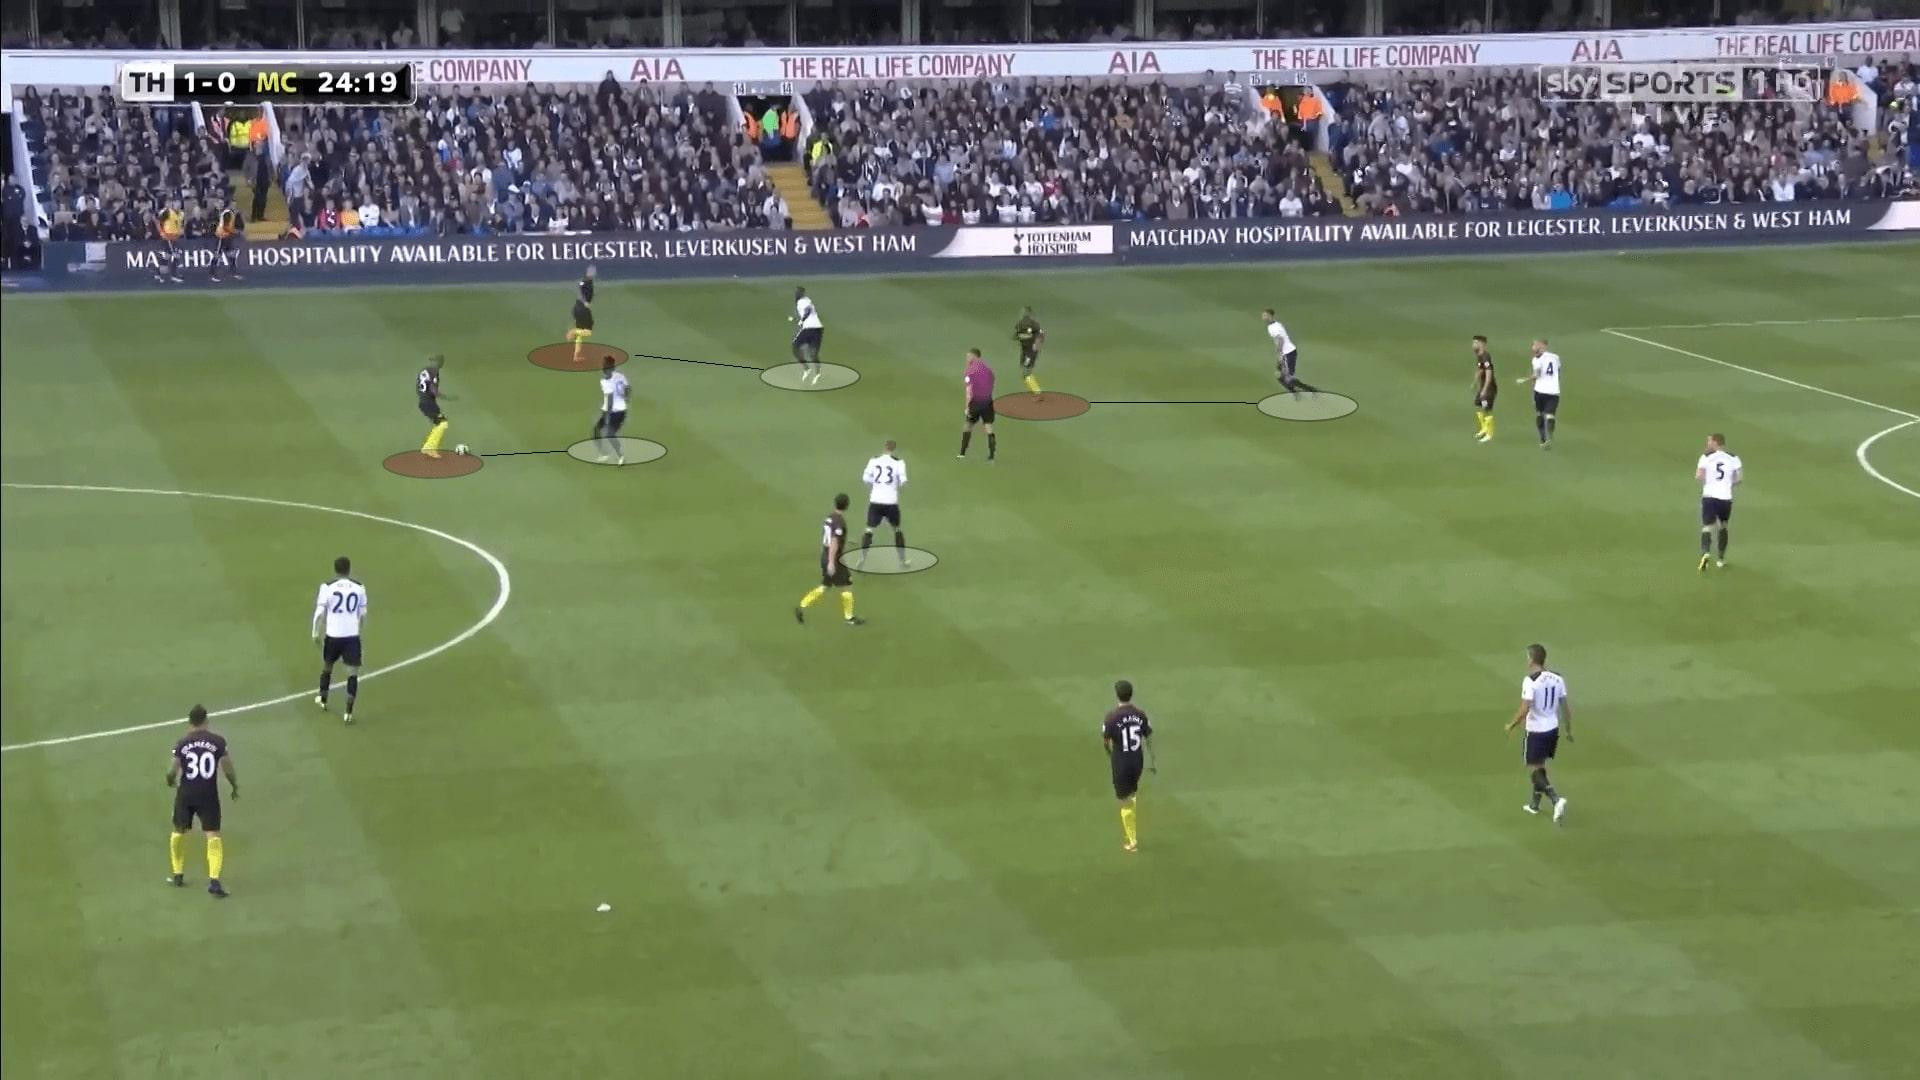 Premier League 2016/17: Tottenham vs Manchester City - tactical analysis tactics